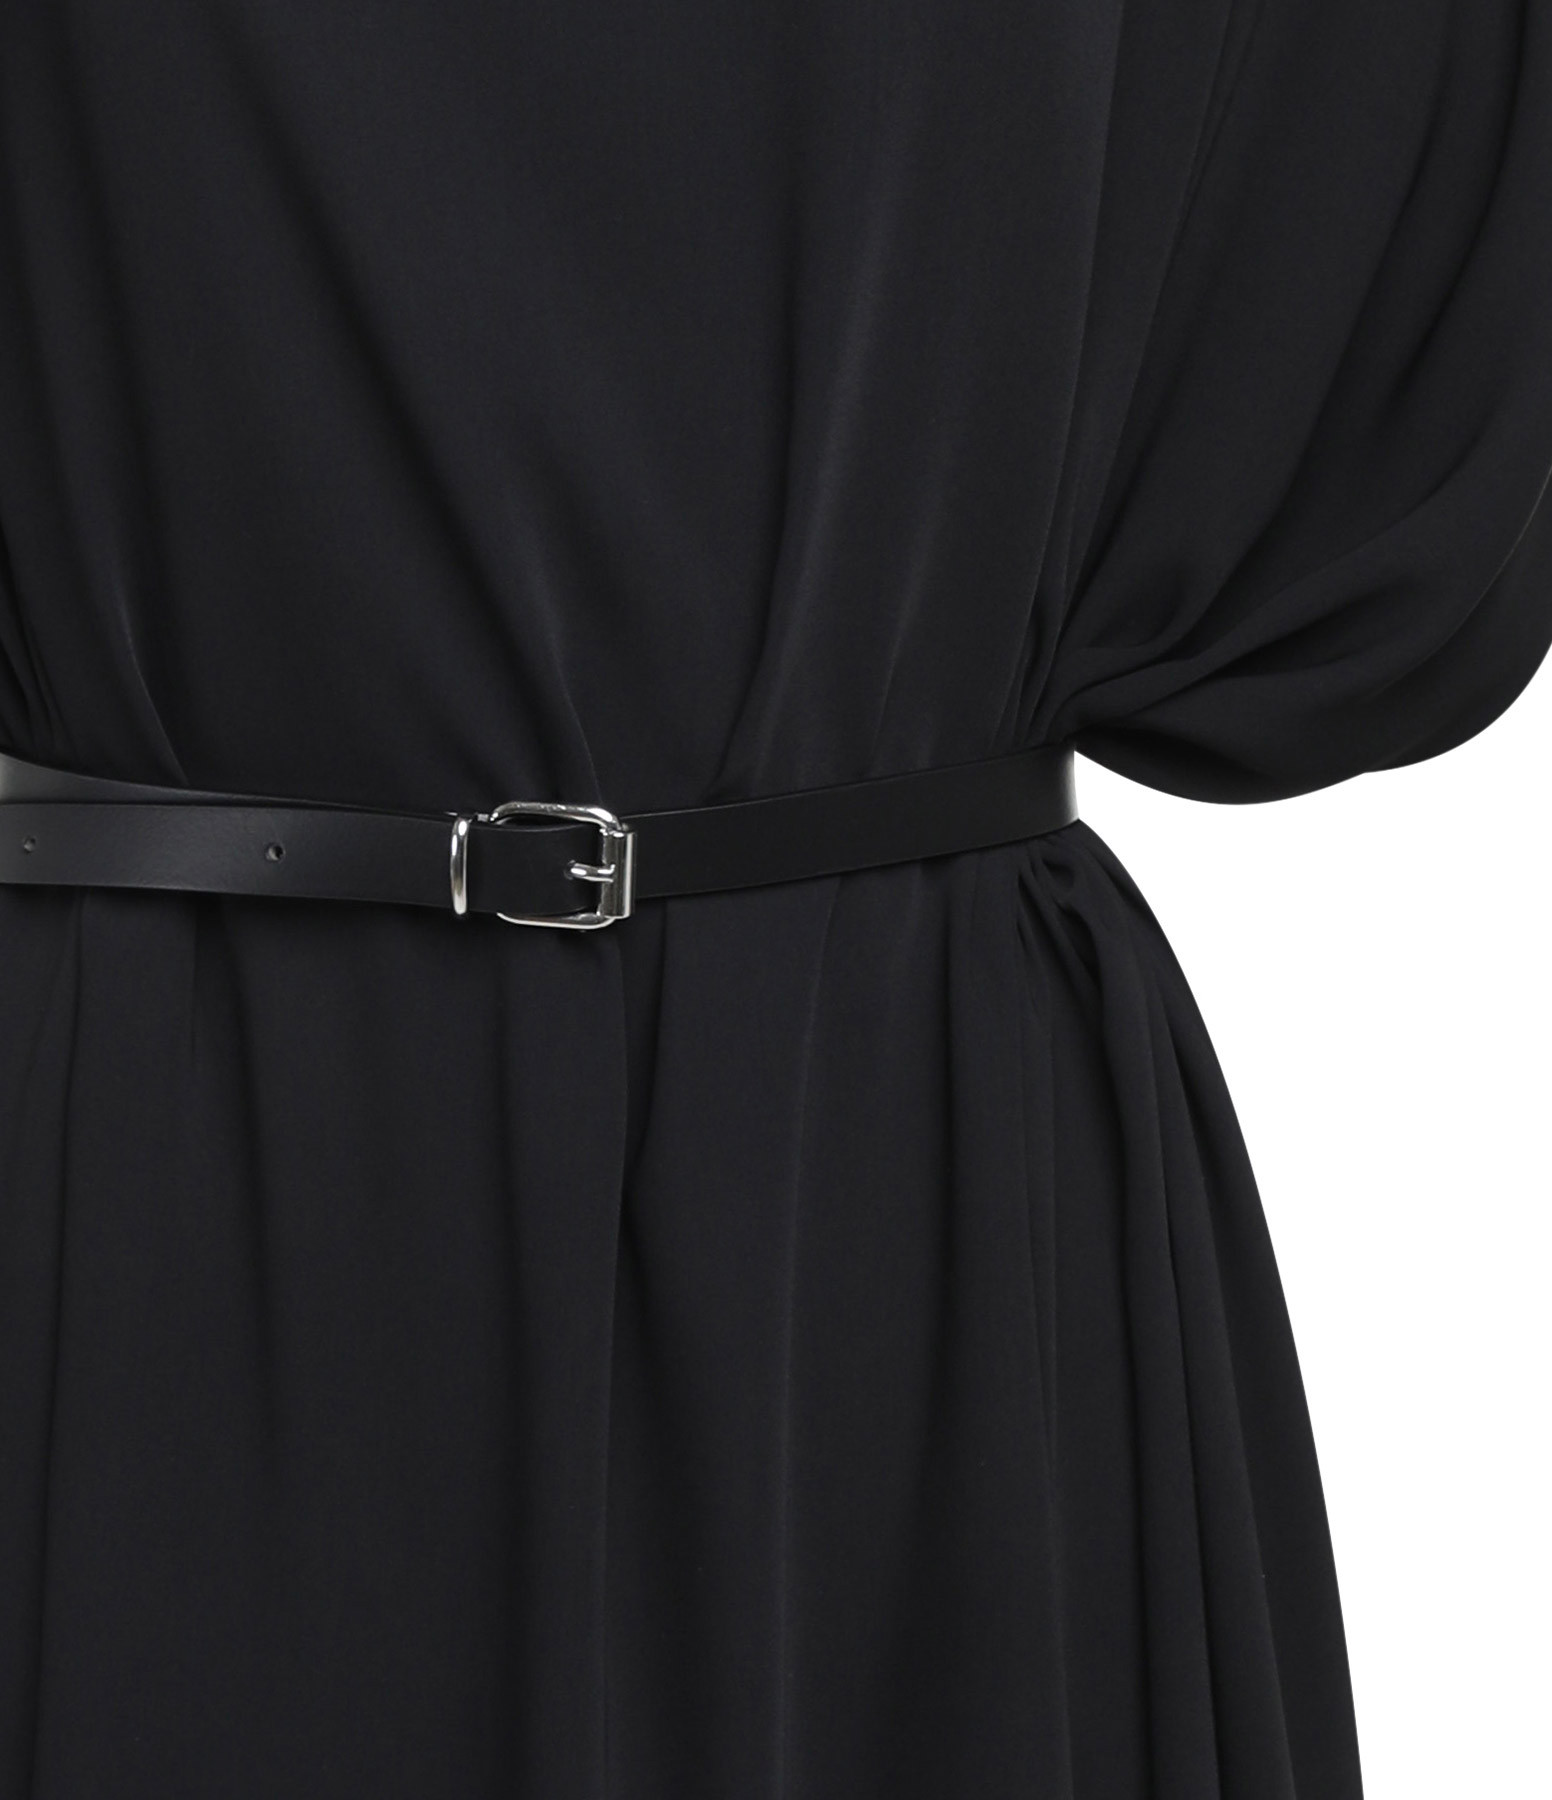 MM6 MAISON MARGIELA - Robe Ronde Noir